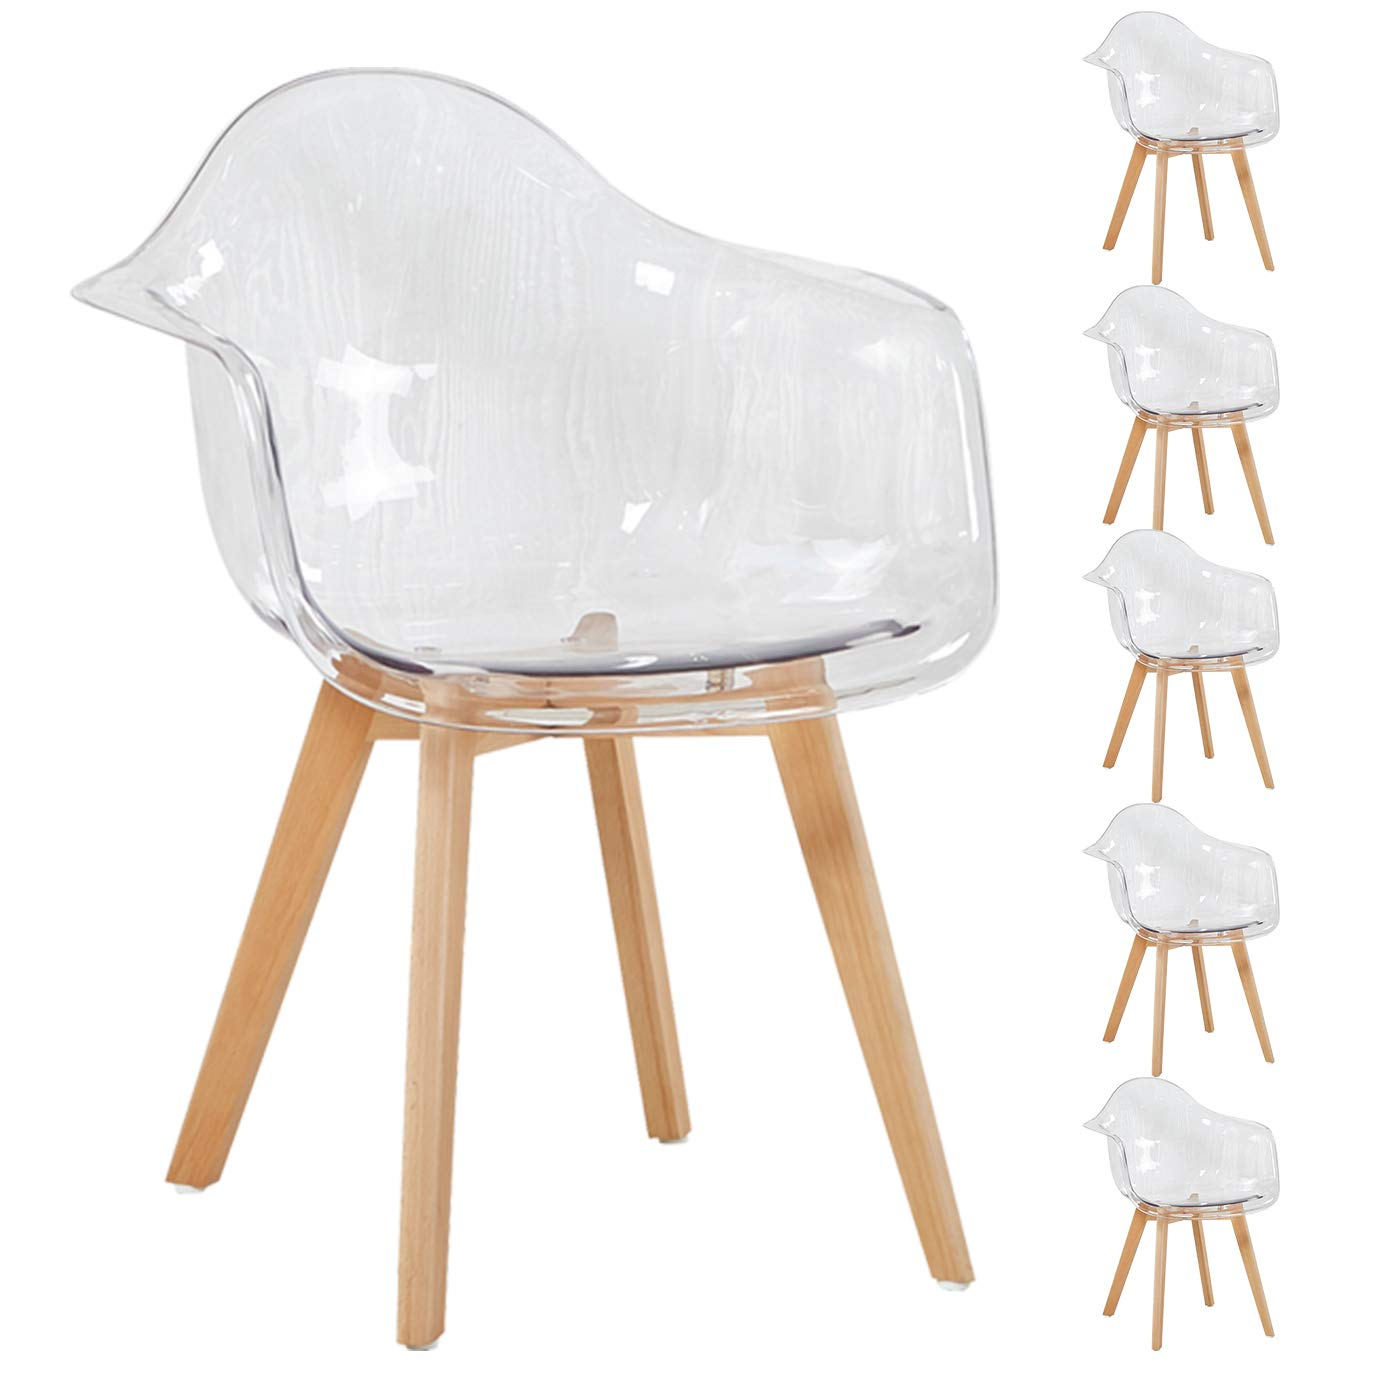 6er set transparent sessel skandinavisch esszimmerstuhl modern wohnzimmer eggree ebay - Esszimmerstuhl skandinavisch ...